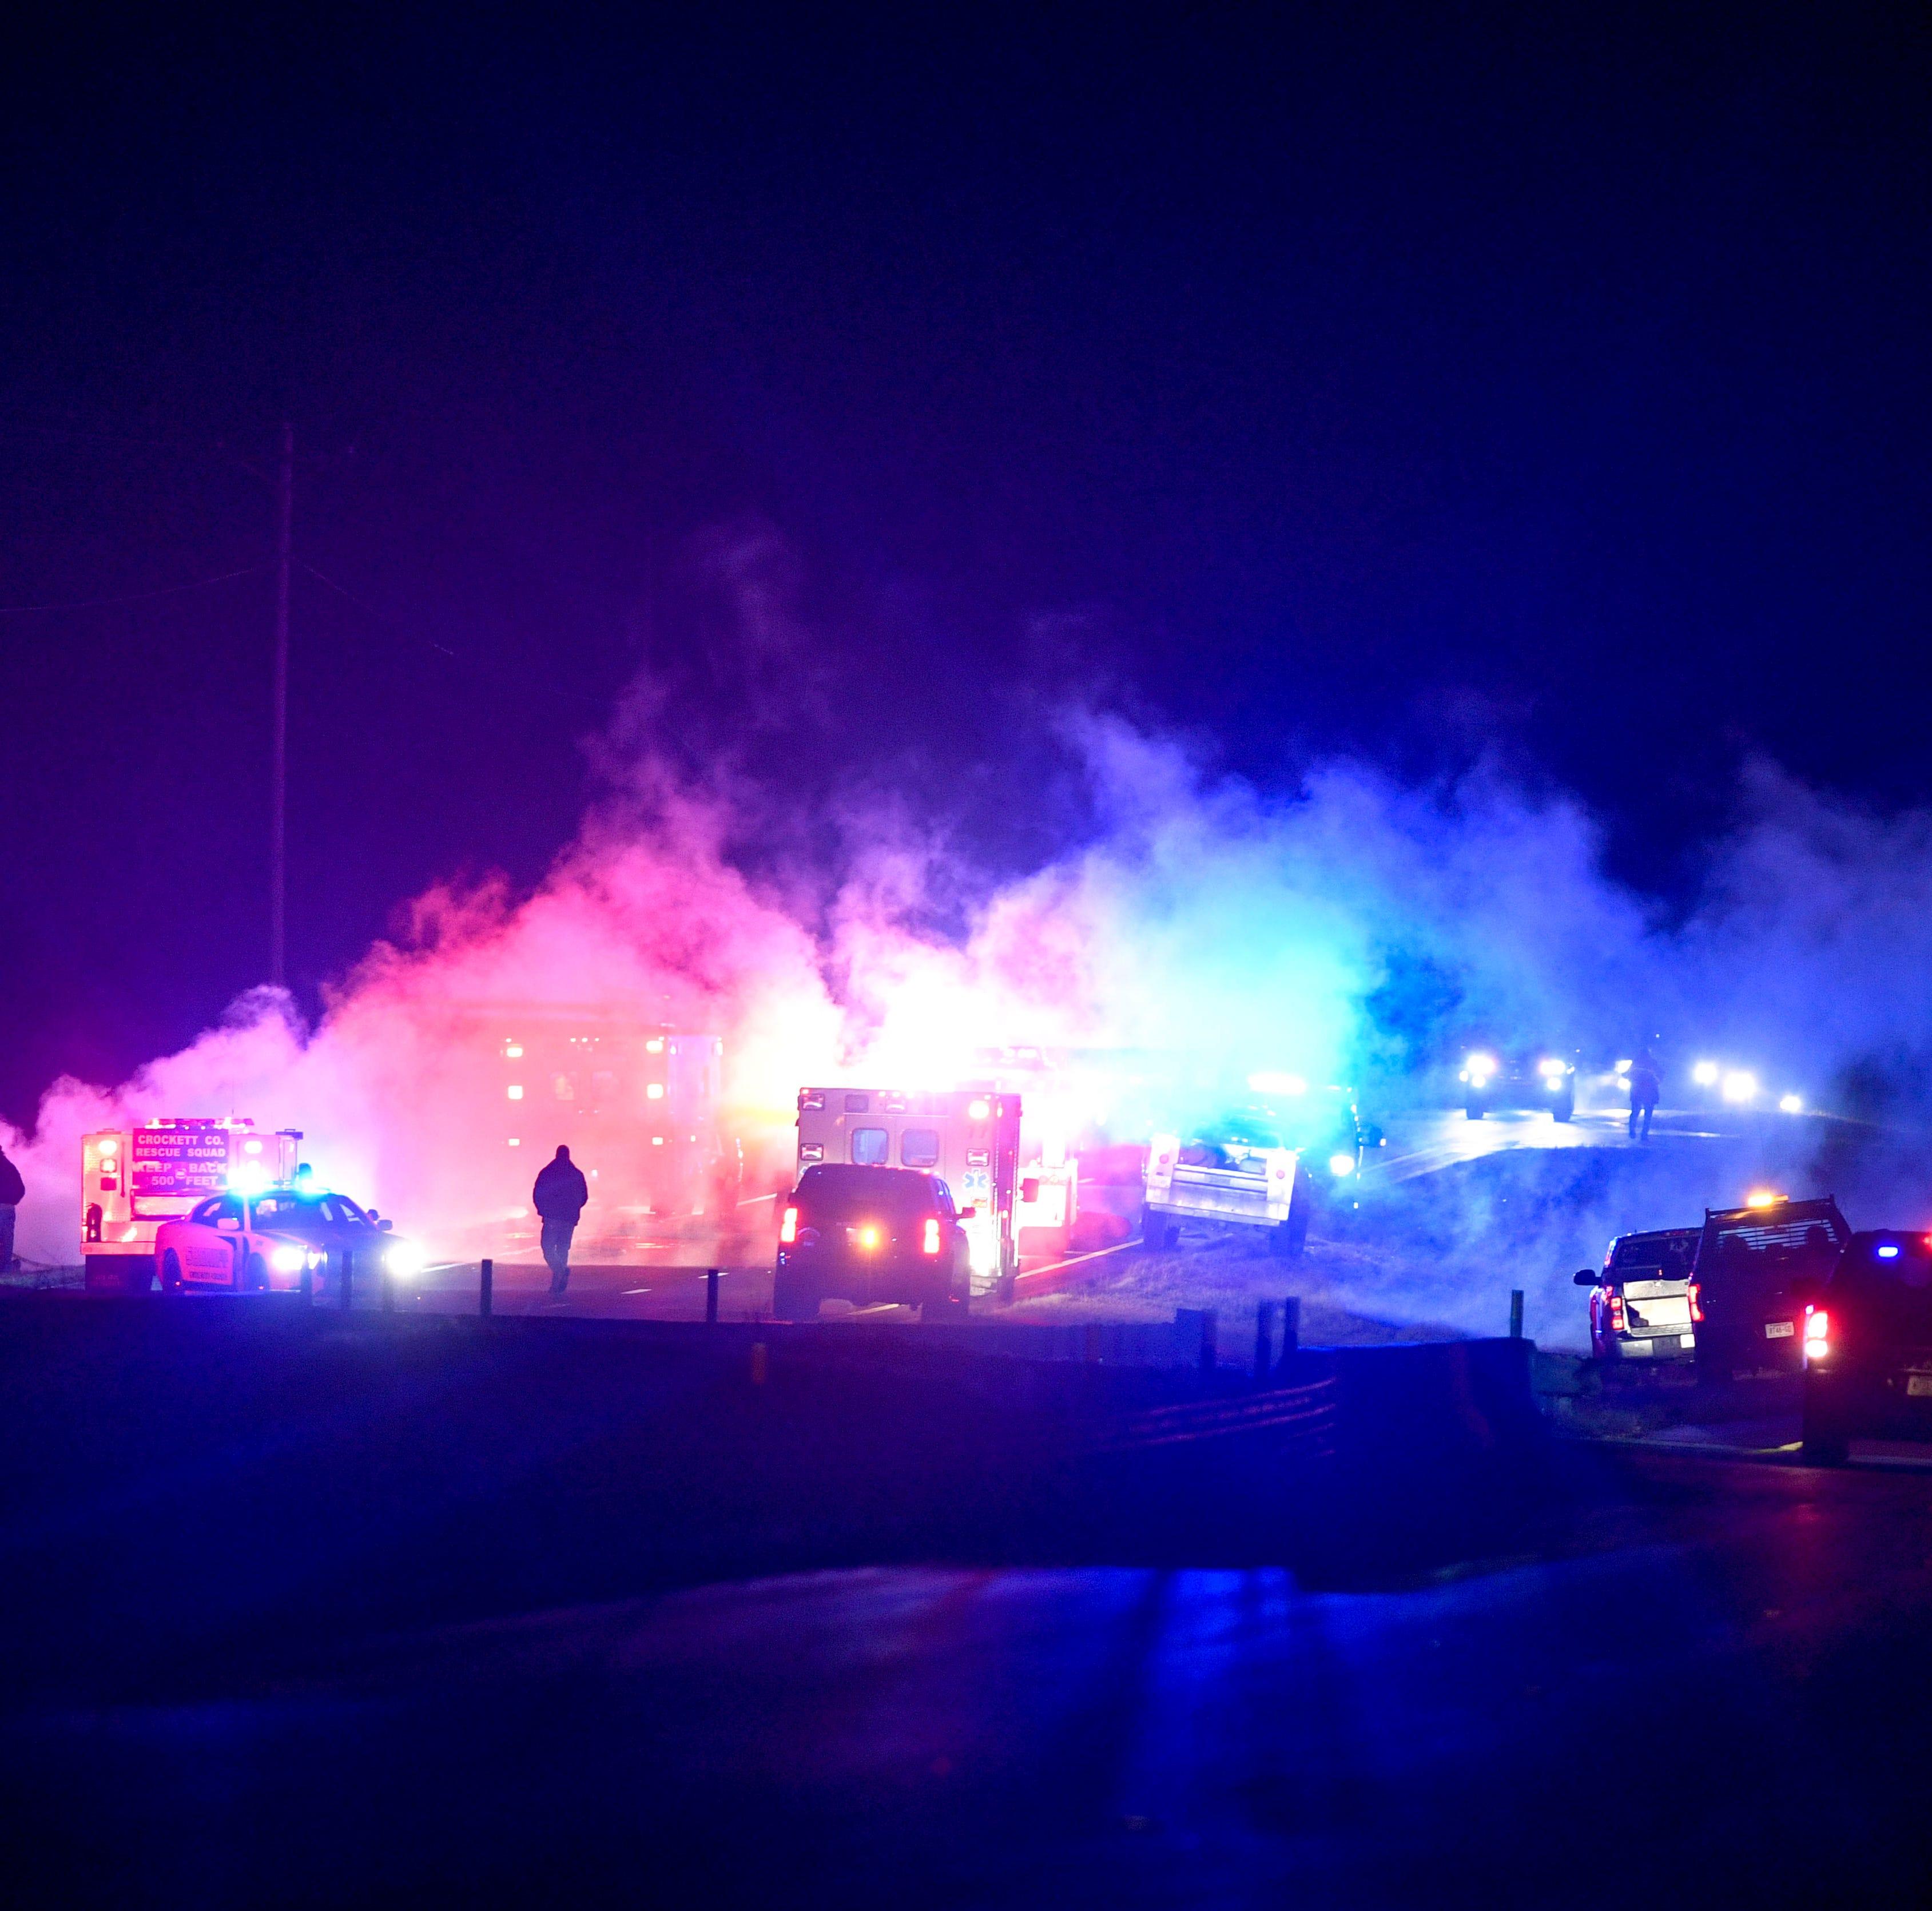 Jackson man hospitalized after fiery Crockett County crash